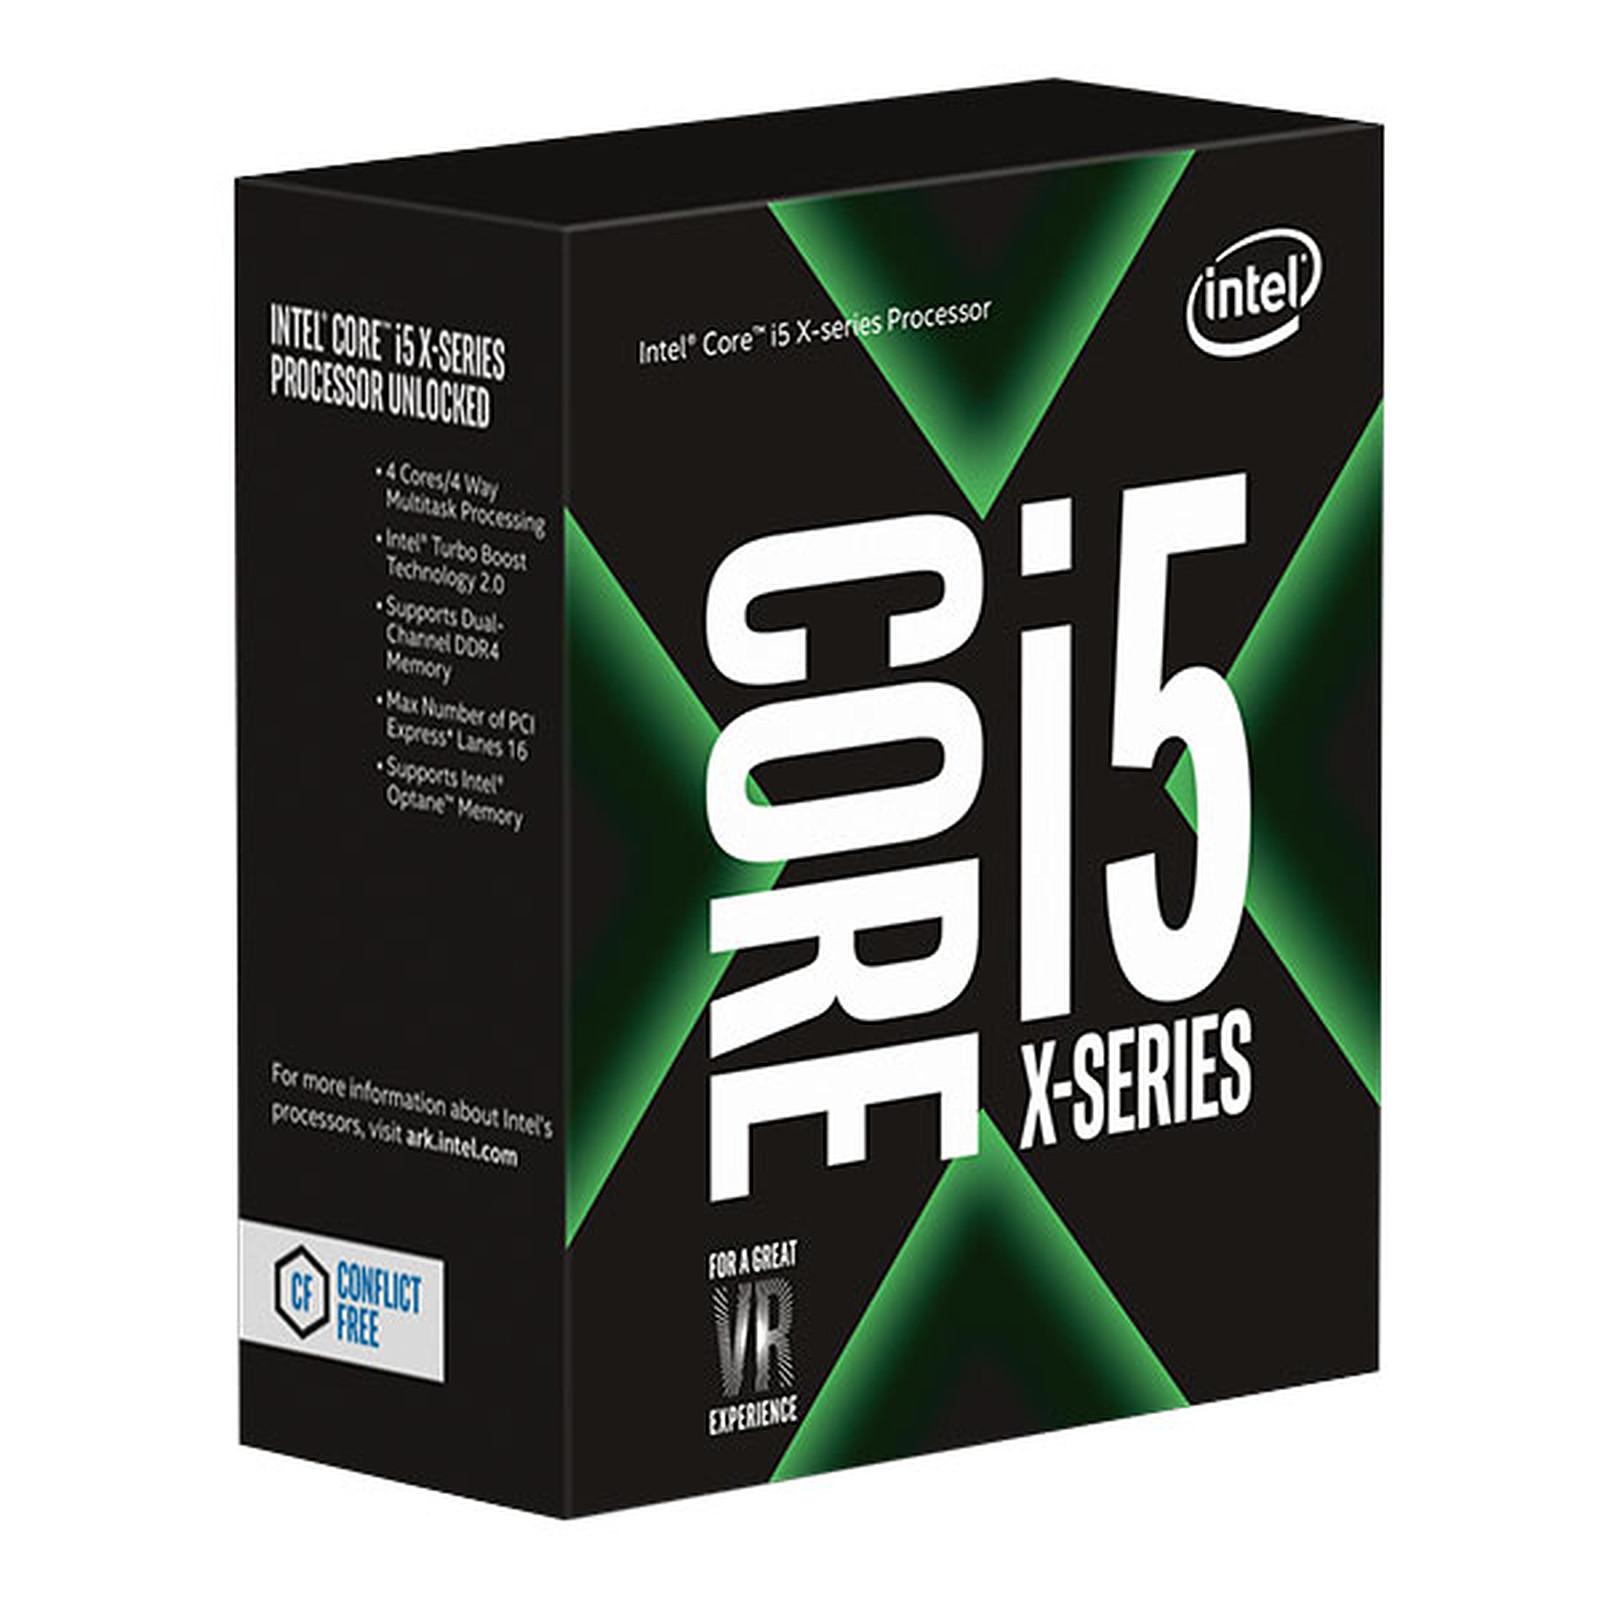 Intel Core i5-7640X (4.0 GHz)